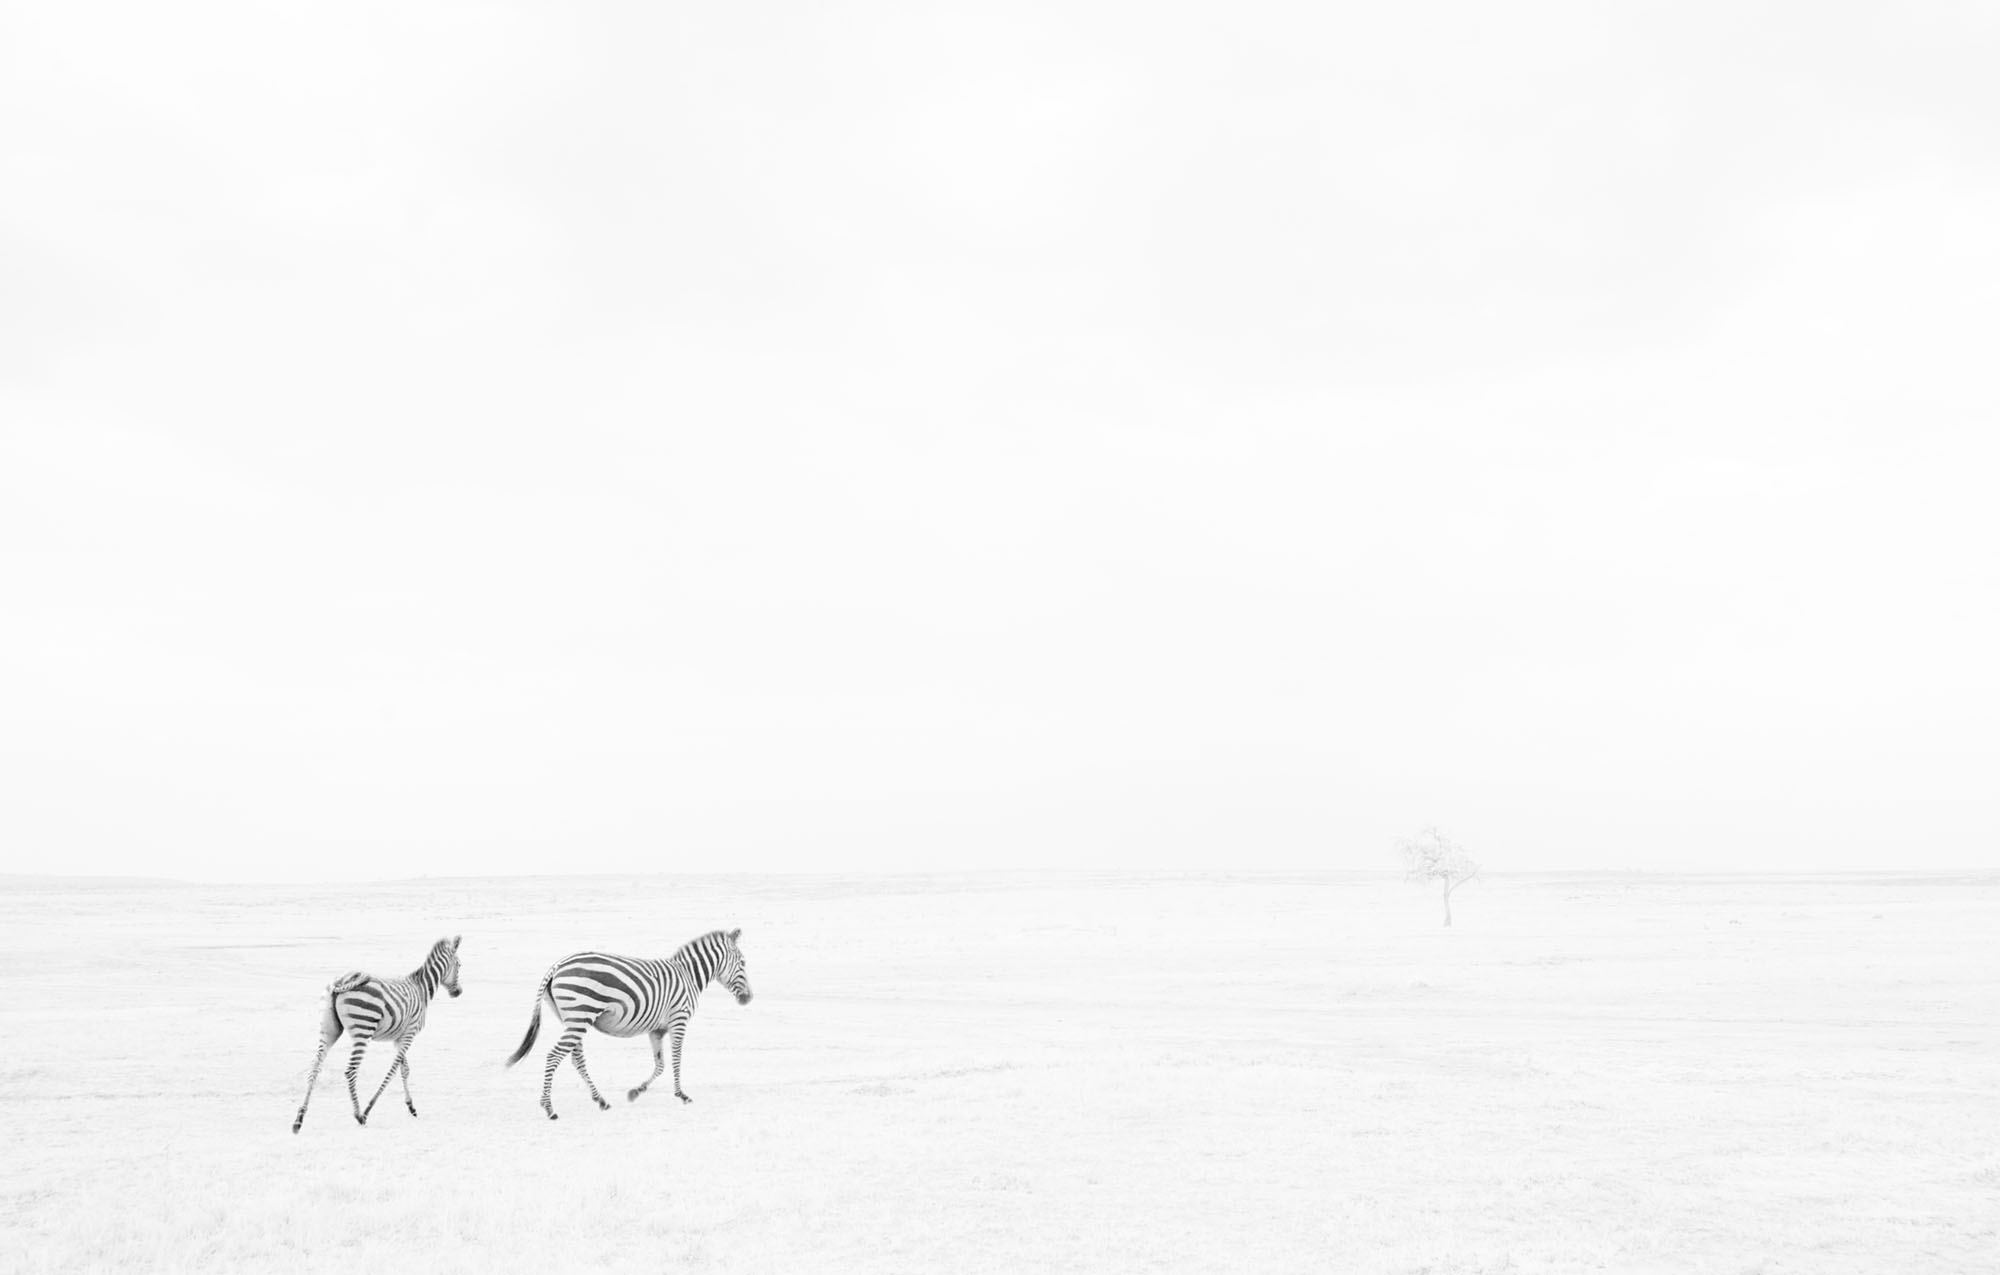 Common or Plains zebra (Equus quagga burchellii). Maasai Mara National Reserve, Kenya. July 2017.